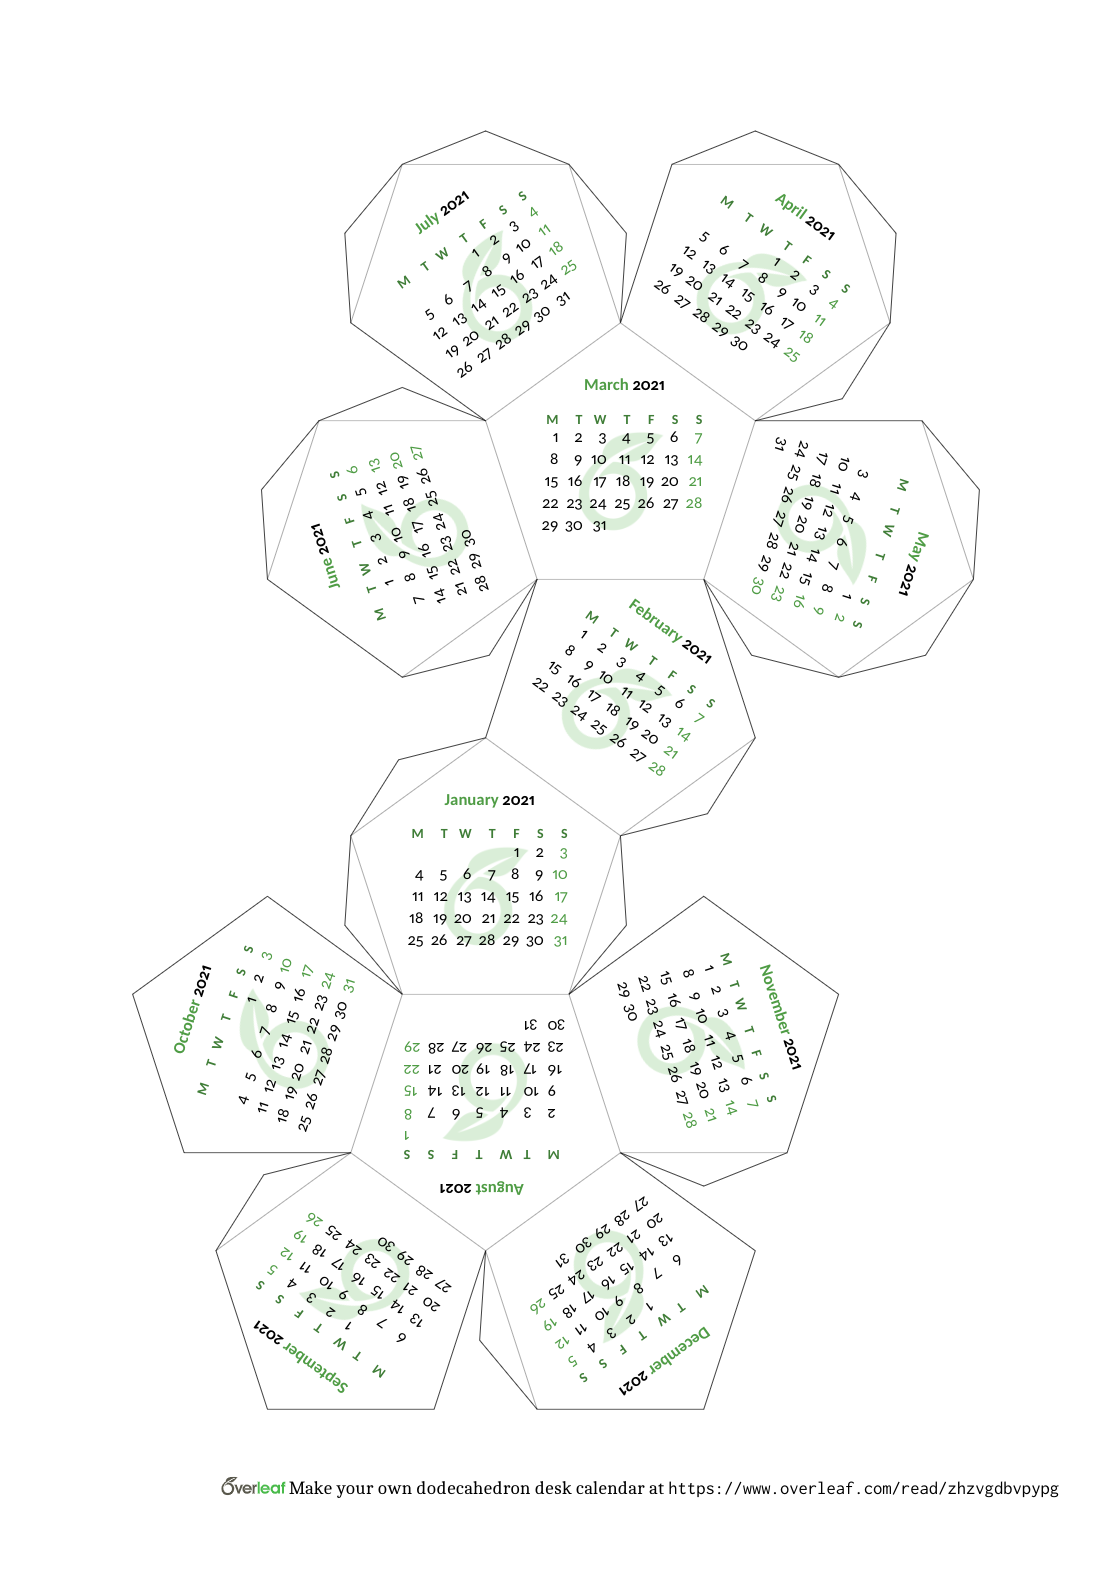 Overleaf-themed dodecahedron calendar